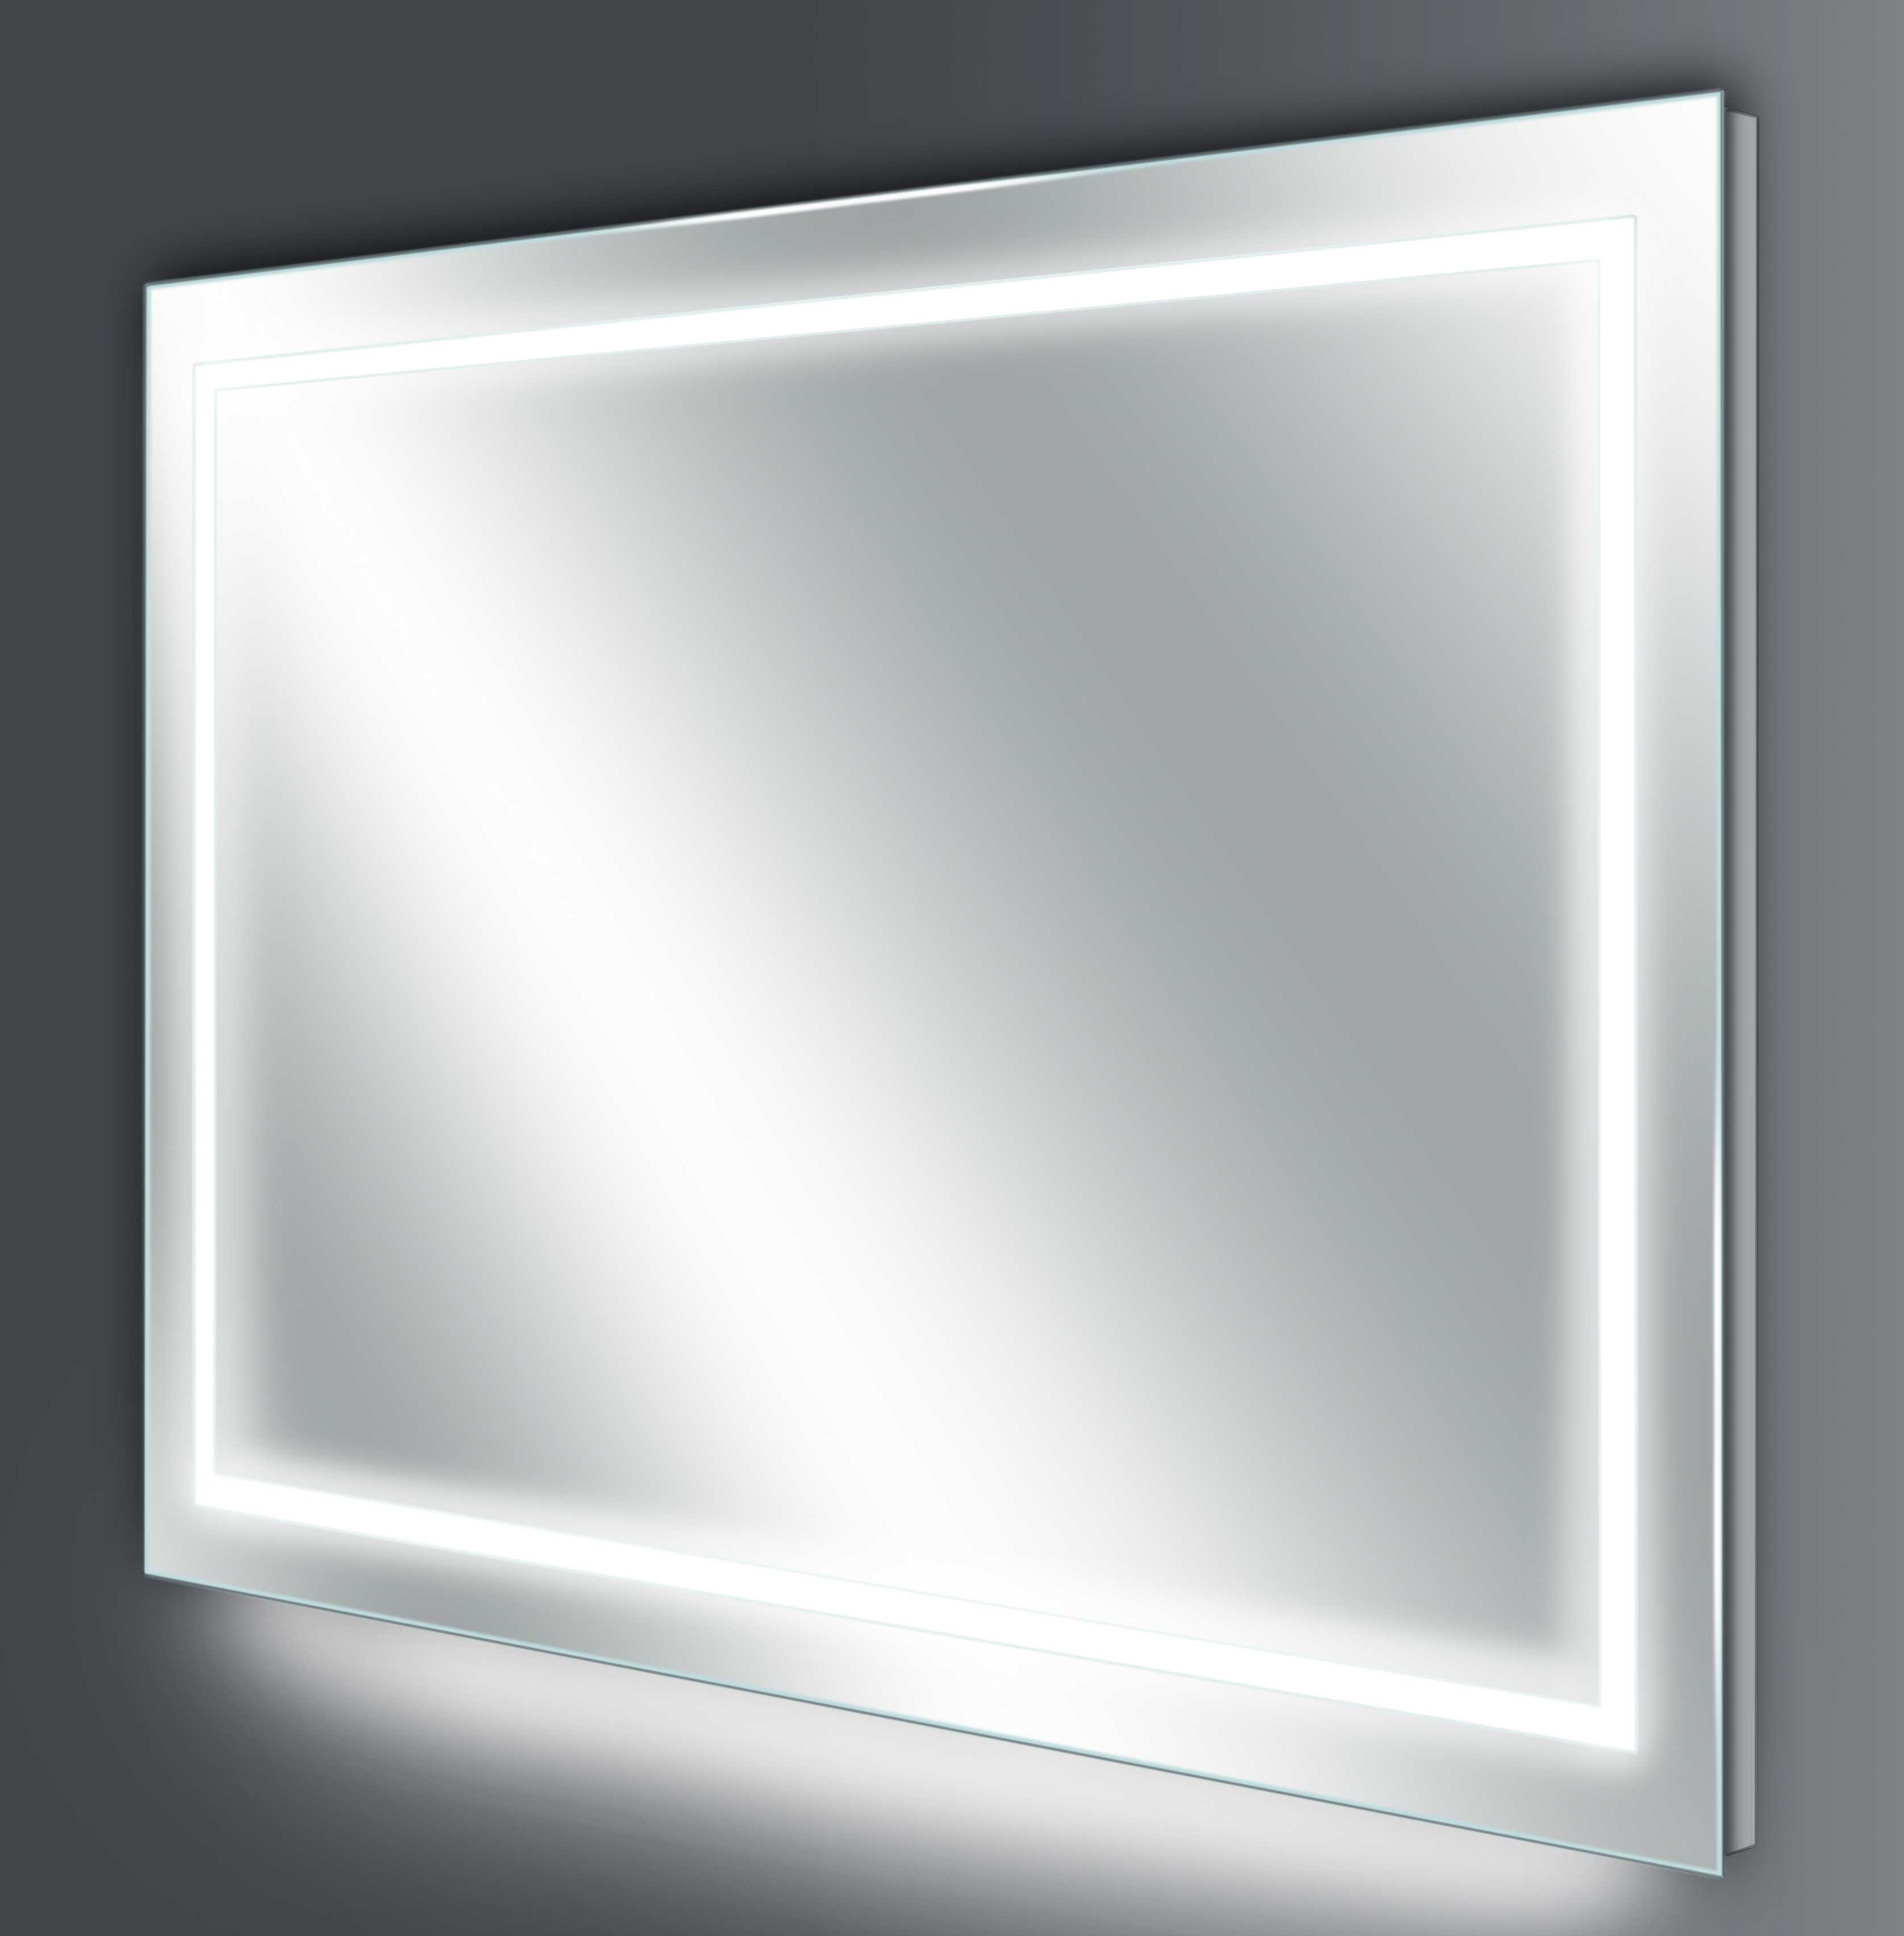 IVR Trend LED Spiegel mit Beleuchtung